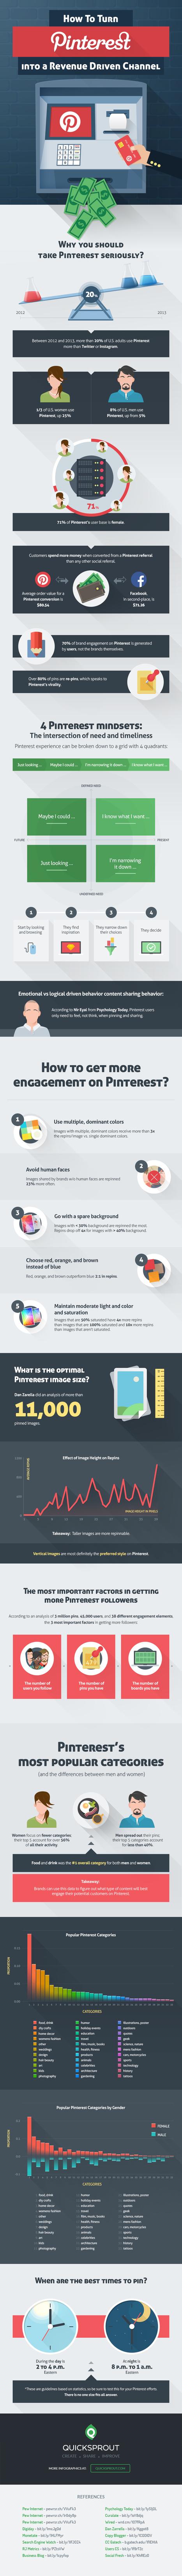 How to Turn Pinterest into a Revenue Generating Channel | Votre branding en IRL | Scoop.it